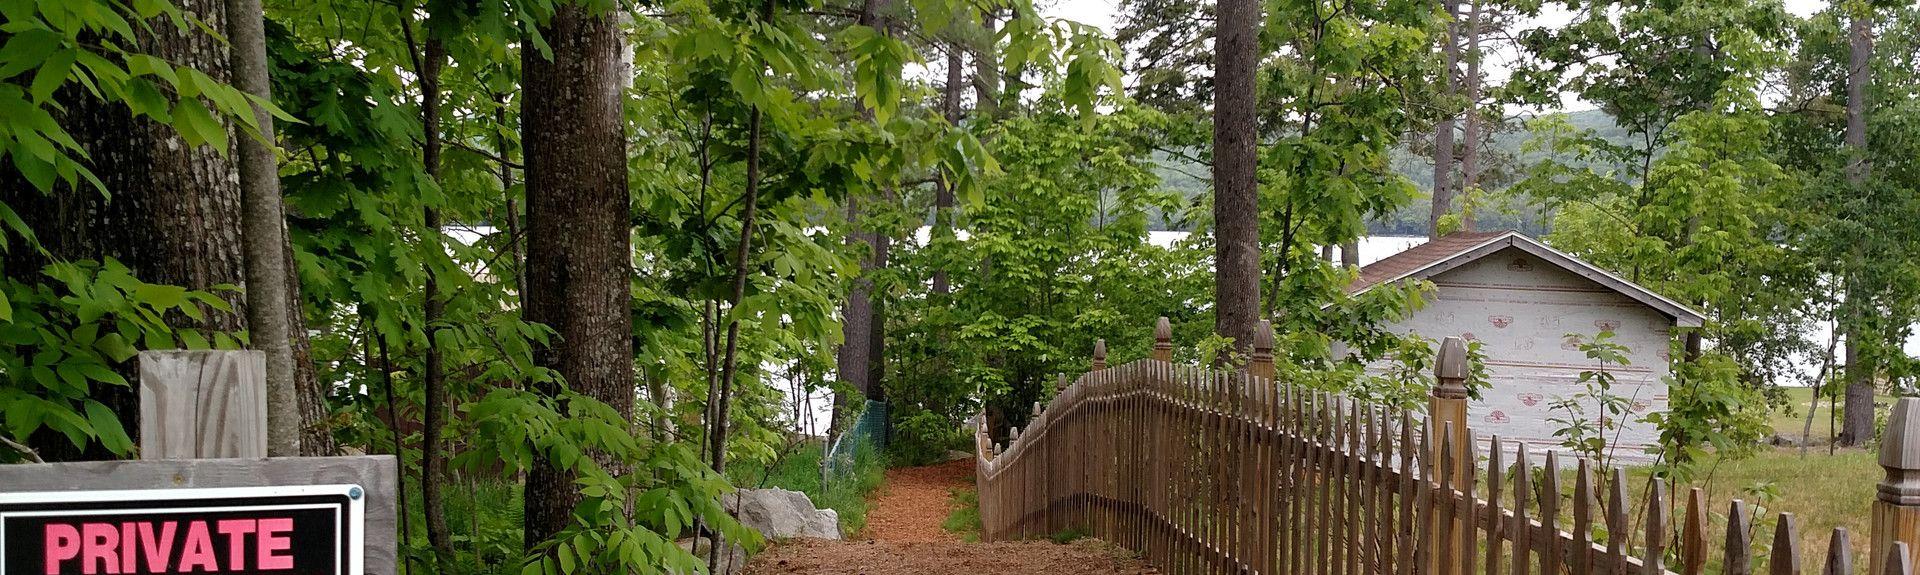 Maranacook Lake, Winthrop, Maine, Verenigde Staten